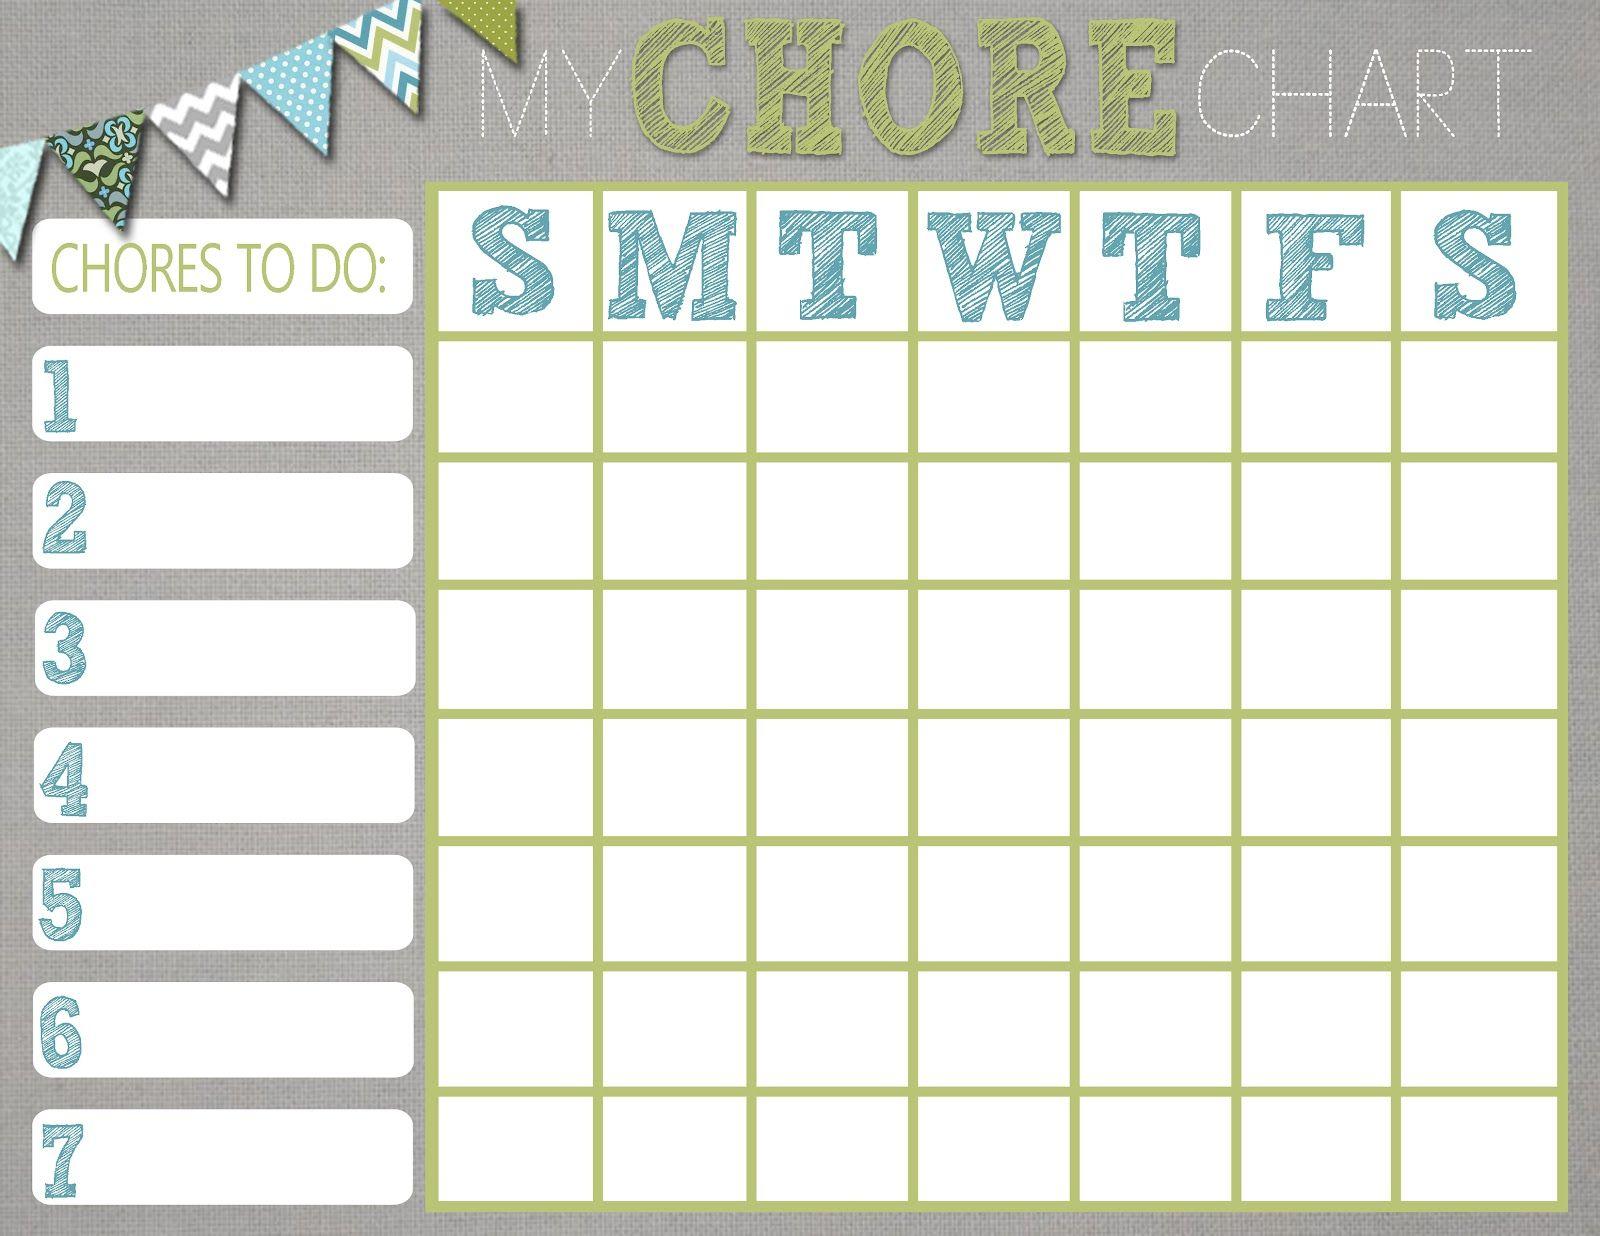 chore-chart-01a01 (1)   chores   pinterest   printable chore chart